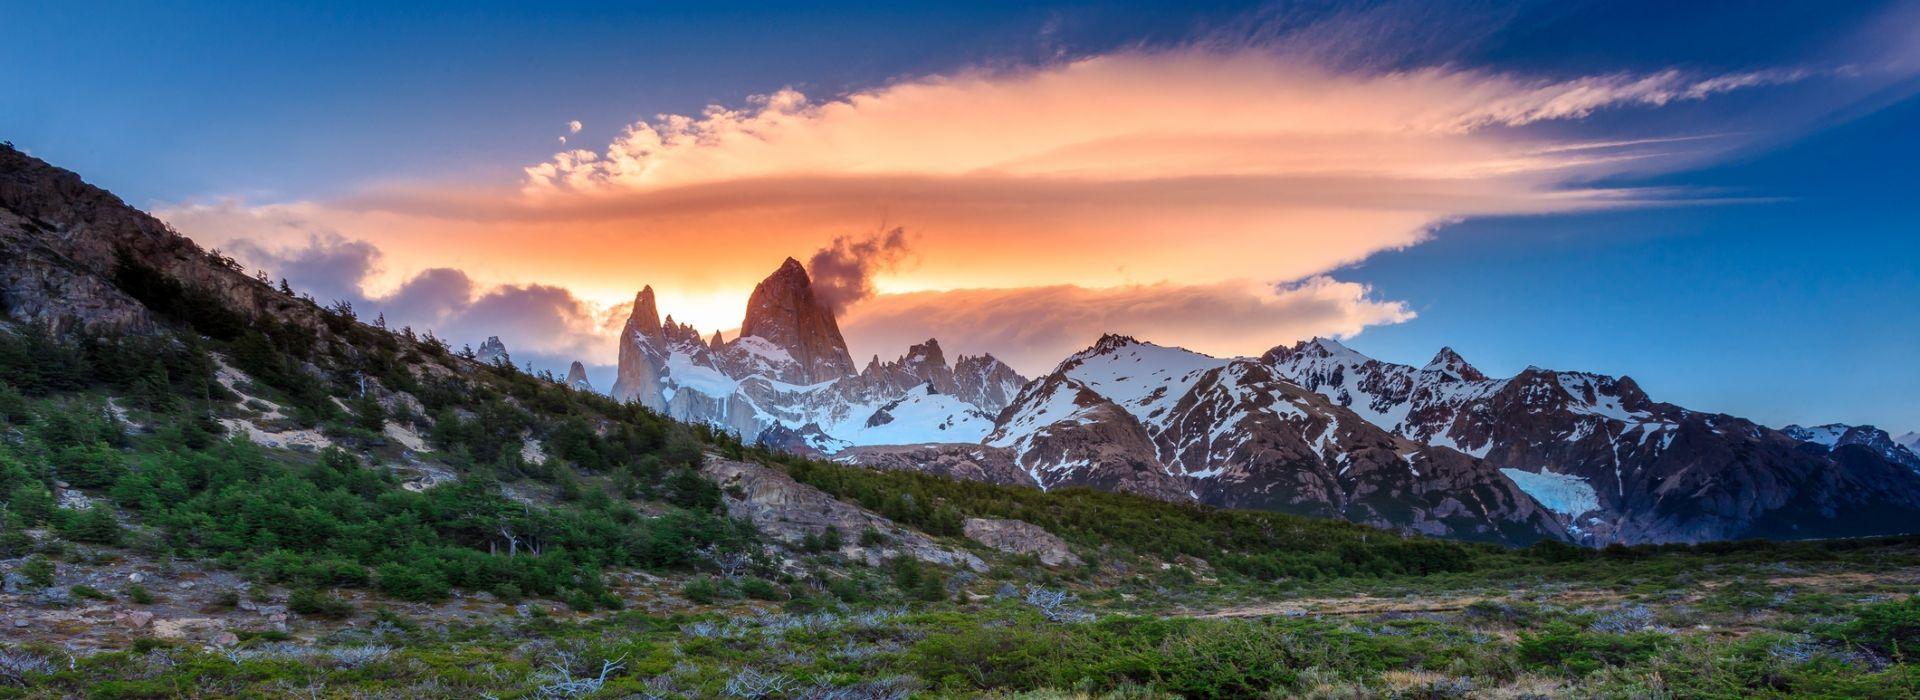 Natural landmarks sightseeing Tours in Argentina